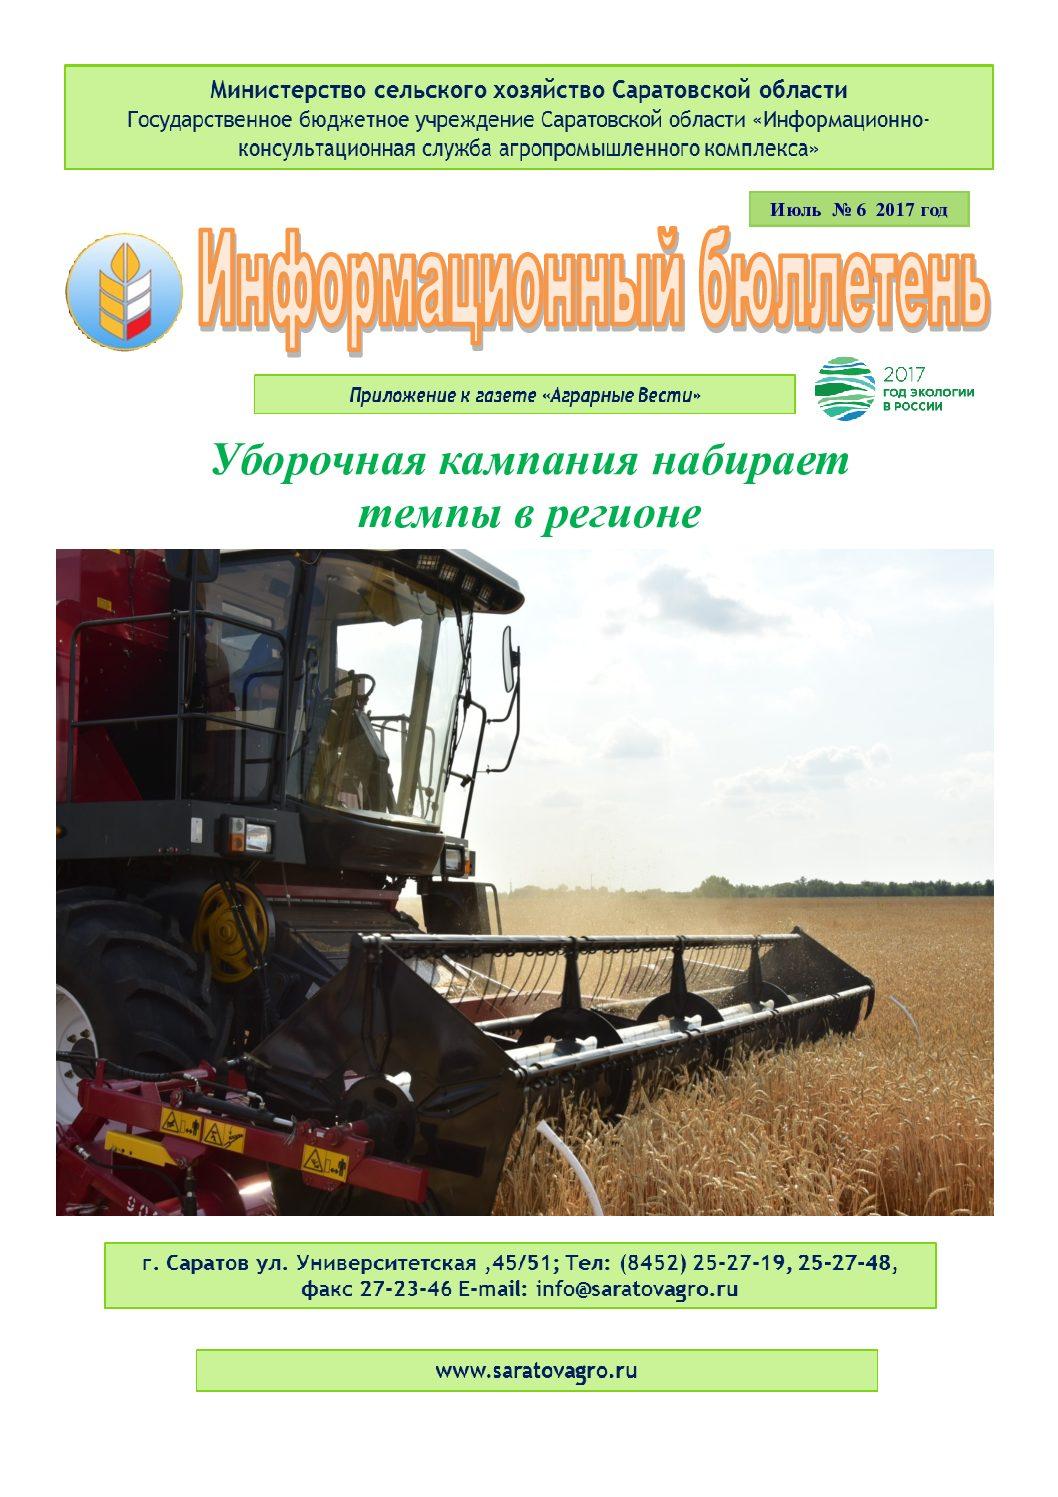 https://saratovagro.ru/wp-content/uploads/2020/08/6.2017-pdf.jpg